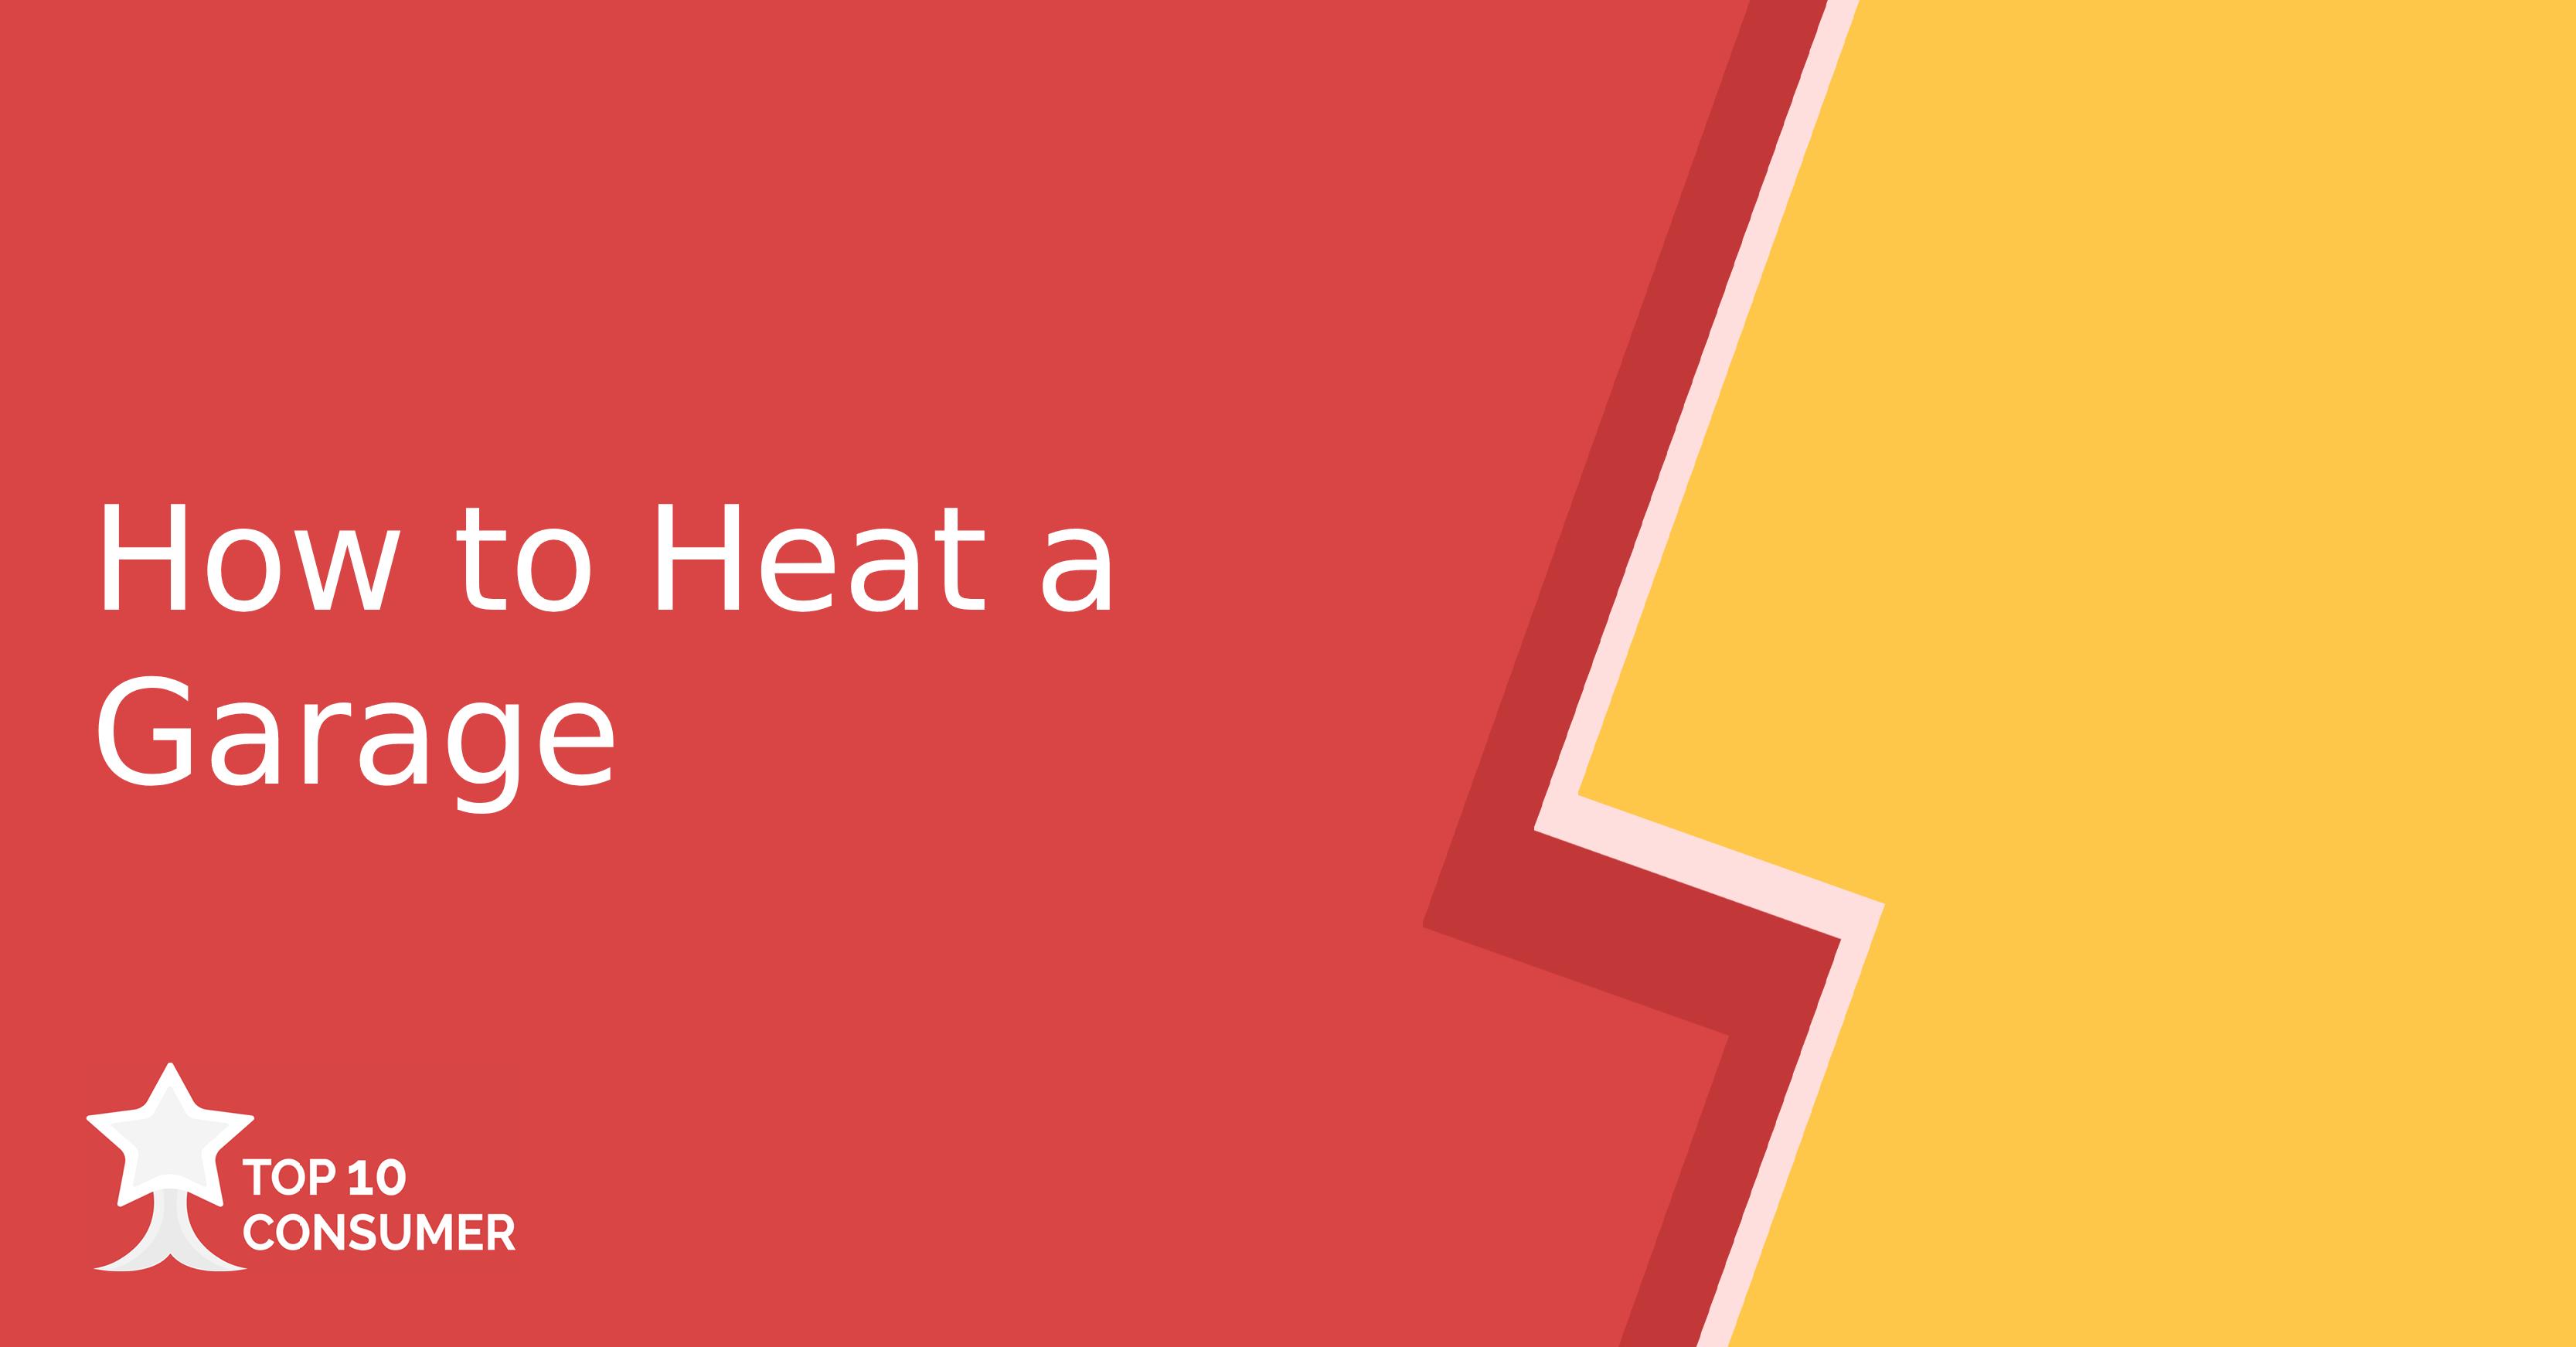 How to heat a garage